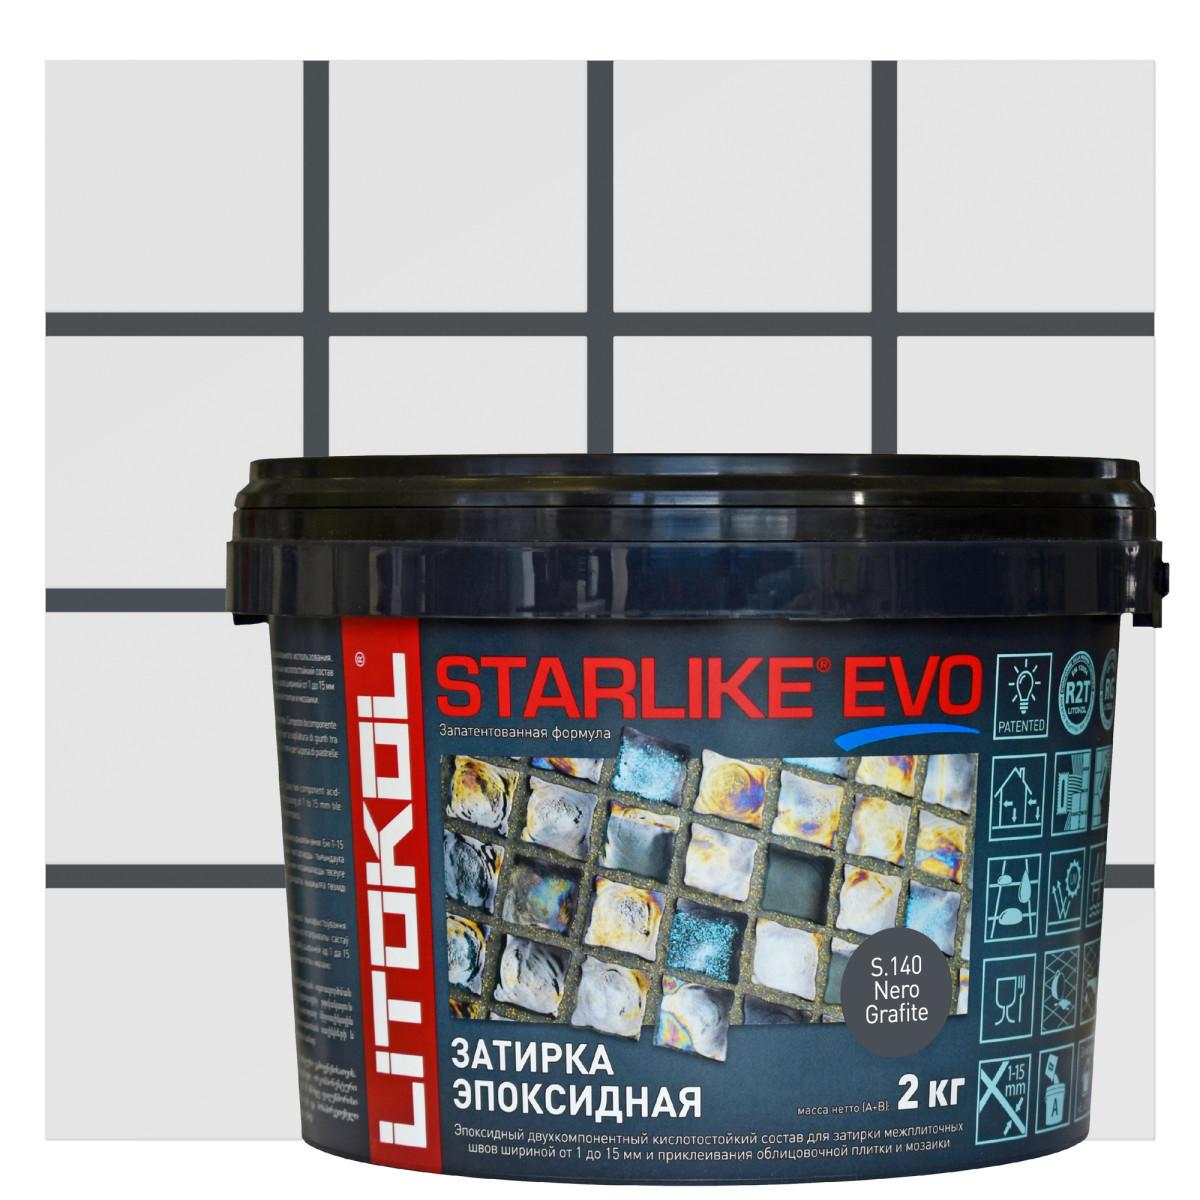 Затирка эпоксидная Starlike Evo S.140 цвет черный Nero Grafite 2 кг